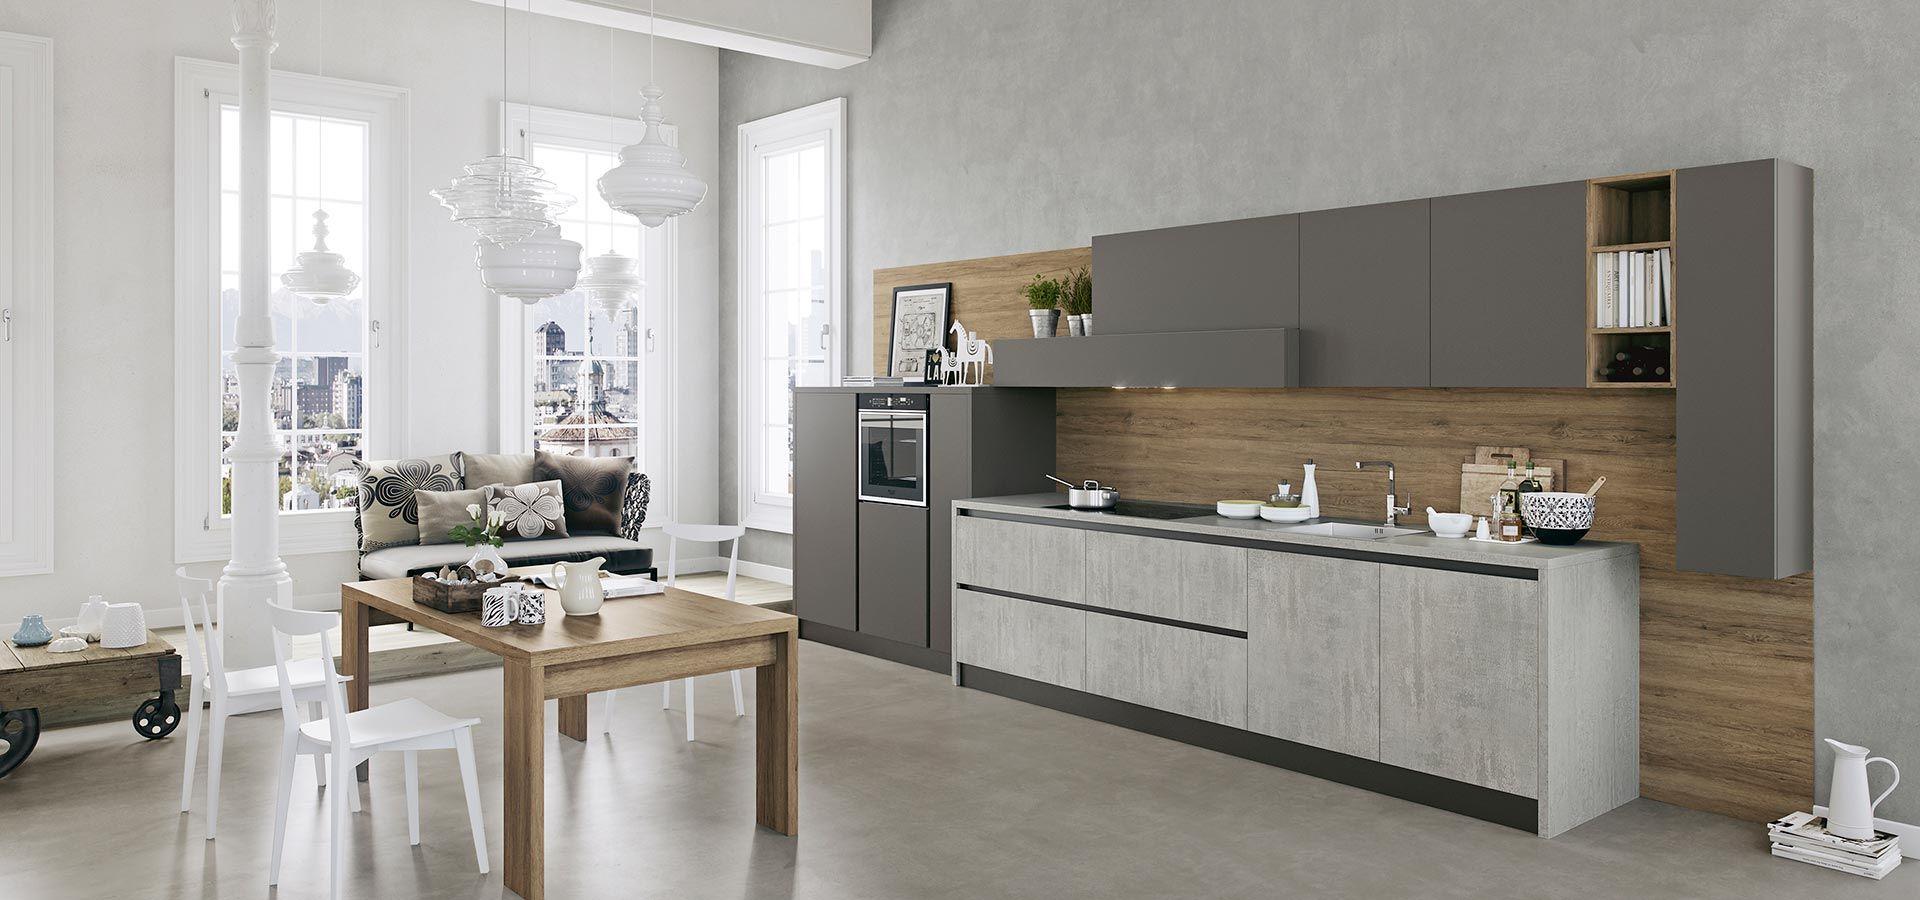 Cucina Moderna - Kalì Finitura cemento e maxximatt lavagna | Piano ...